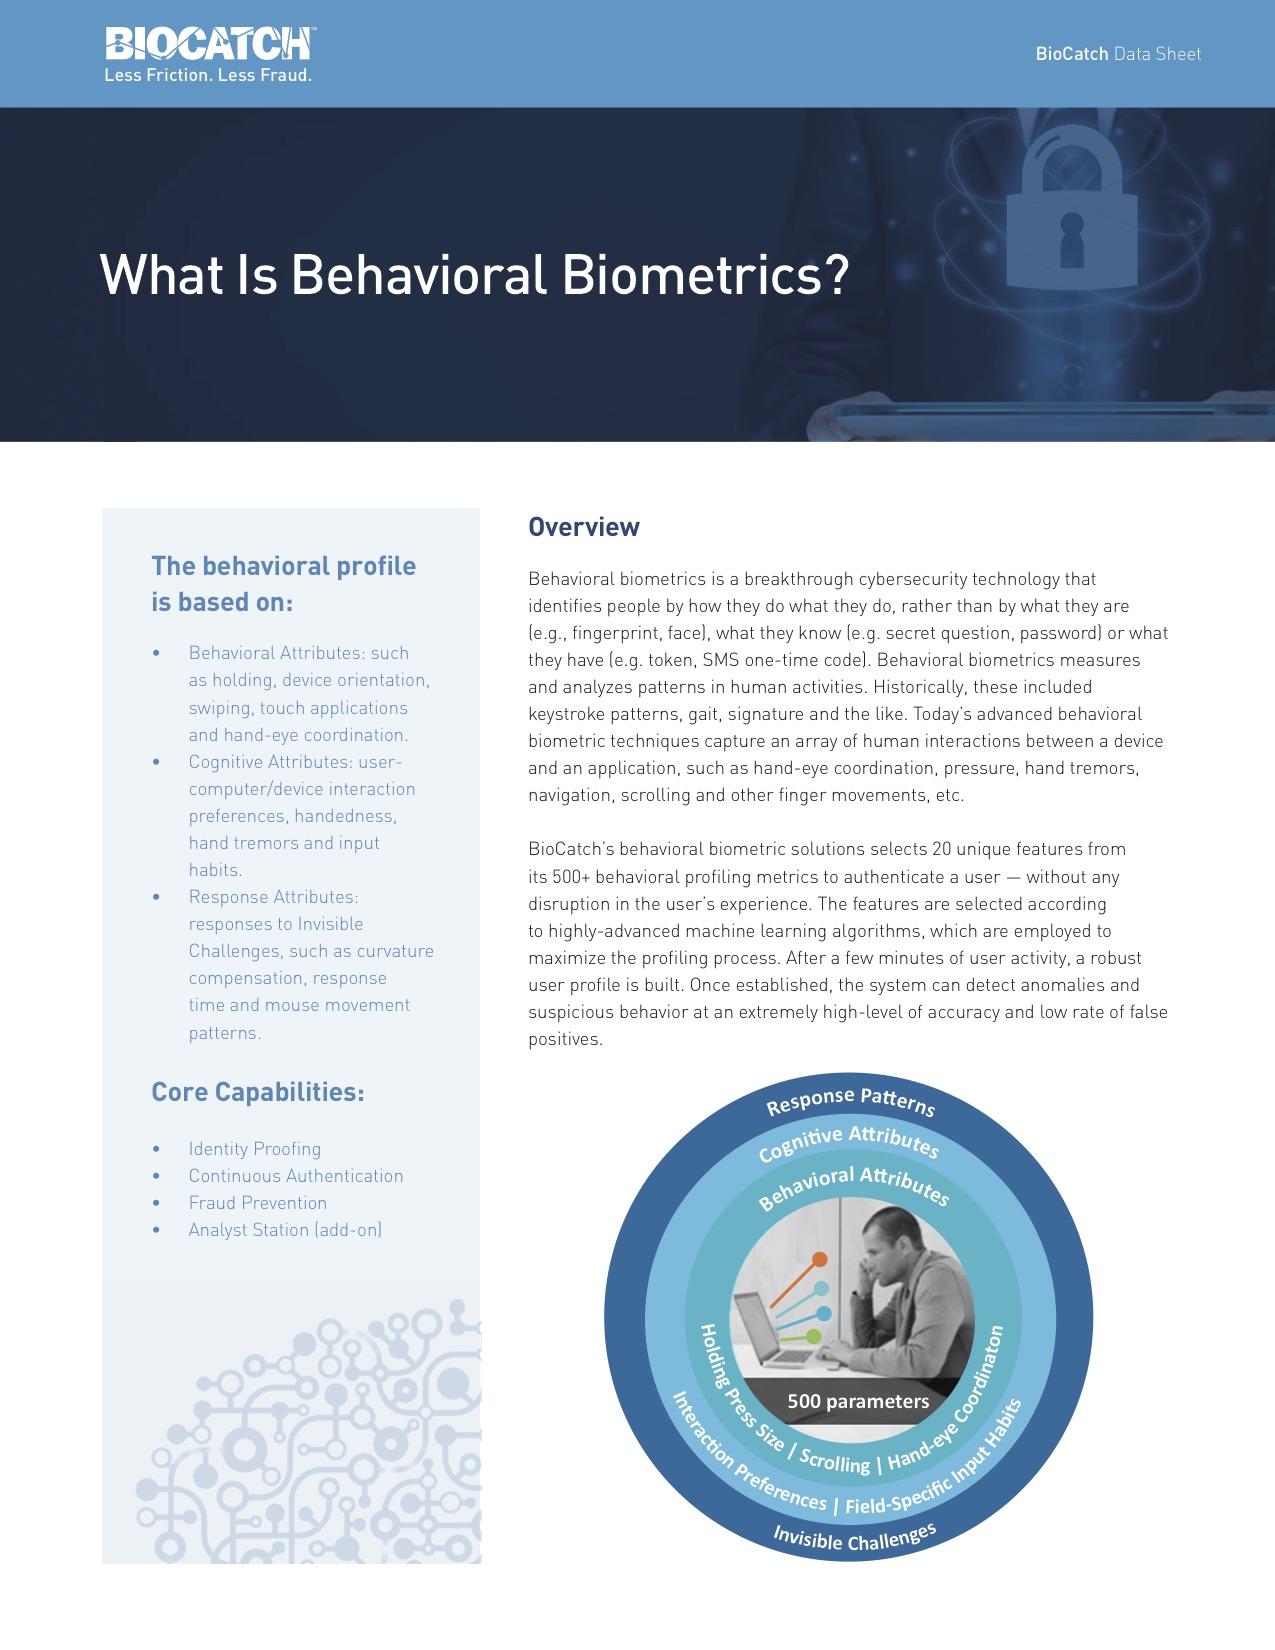 What is Behavioral Biometrics (1).jpg